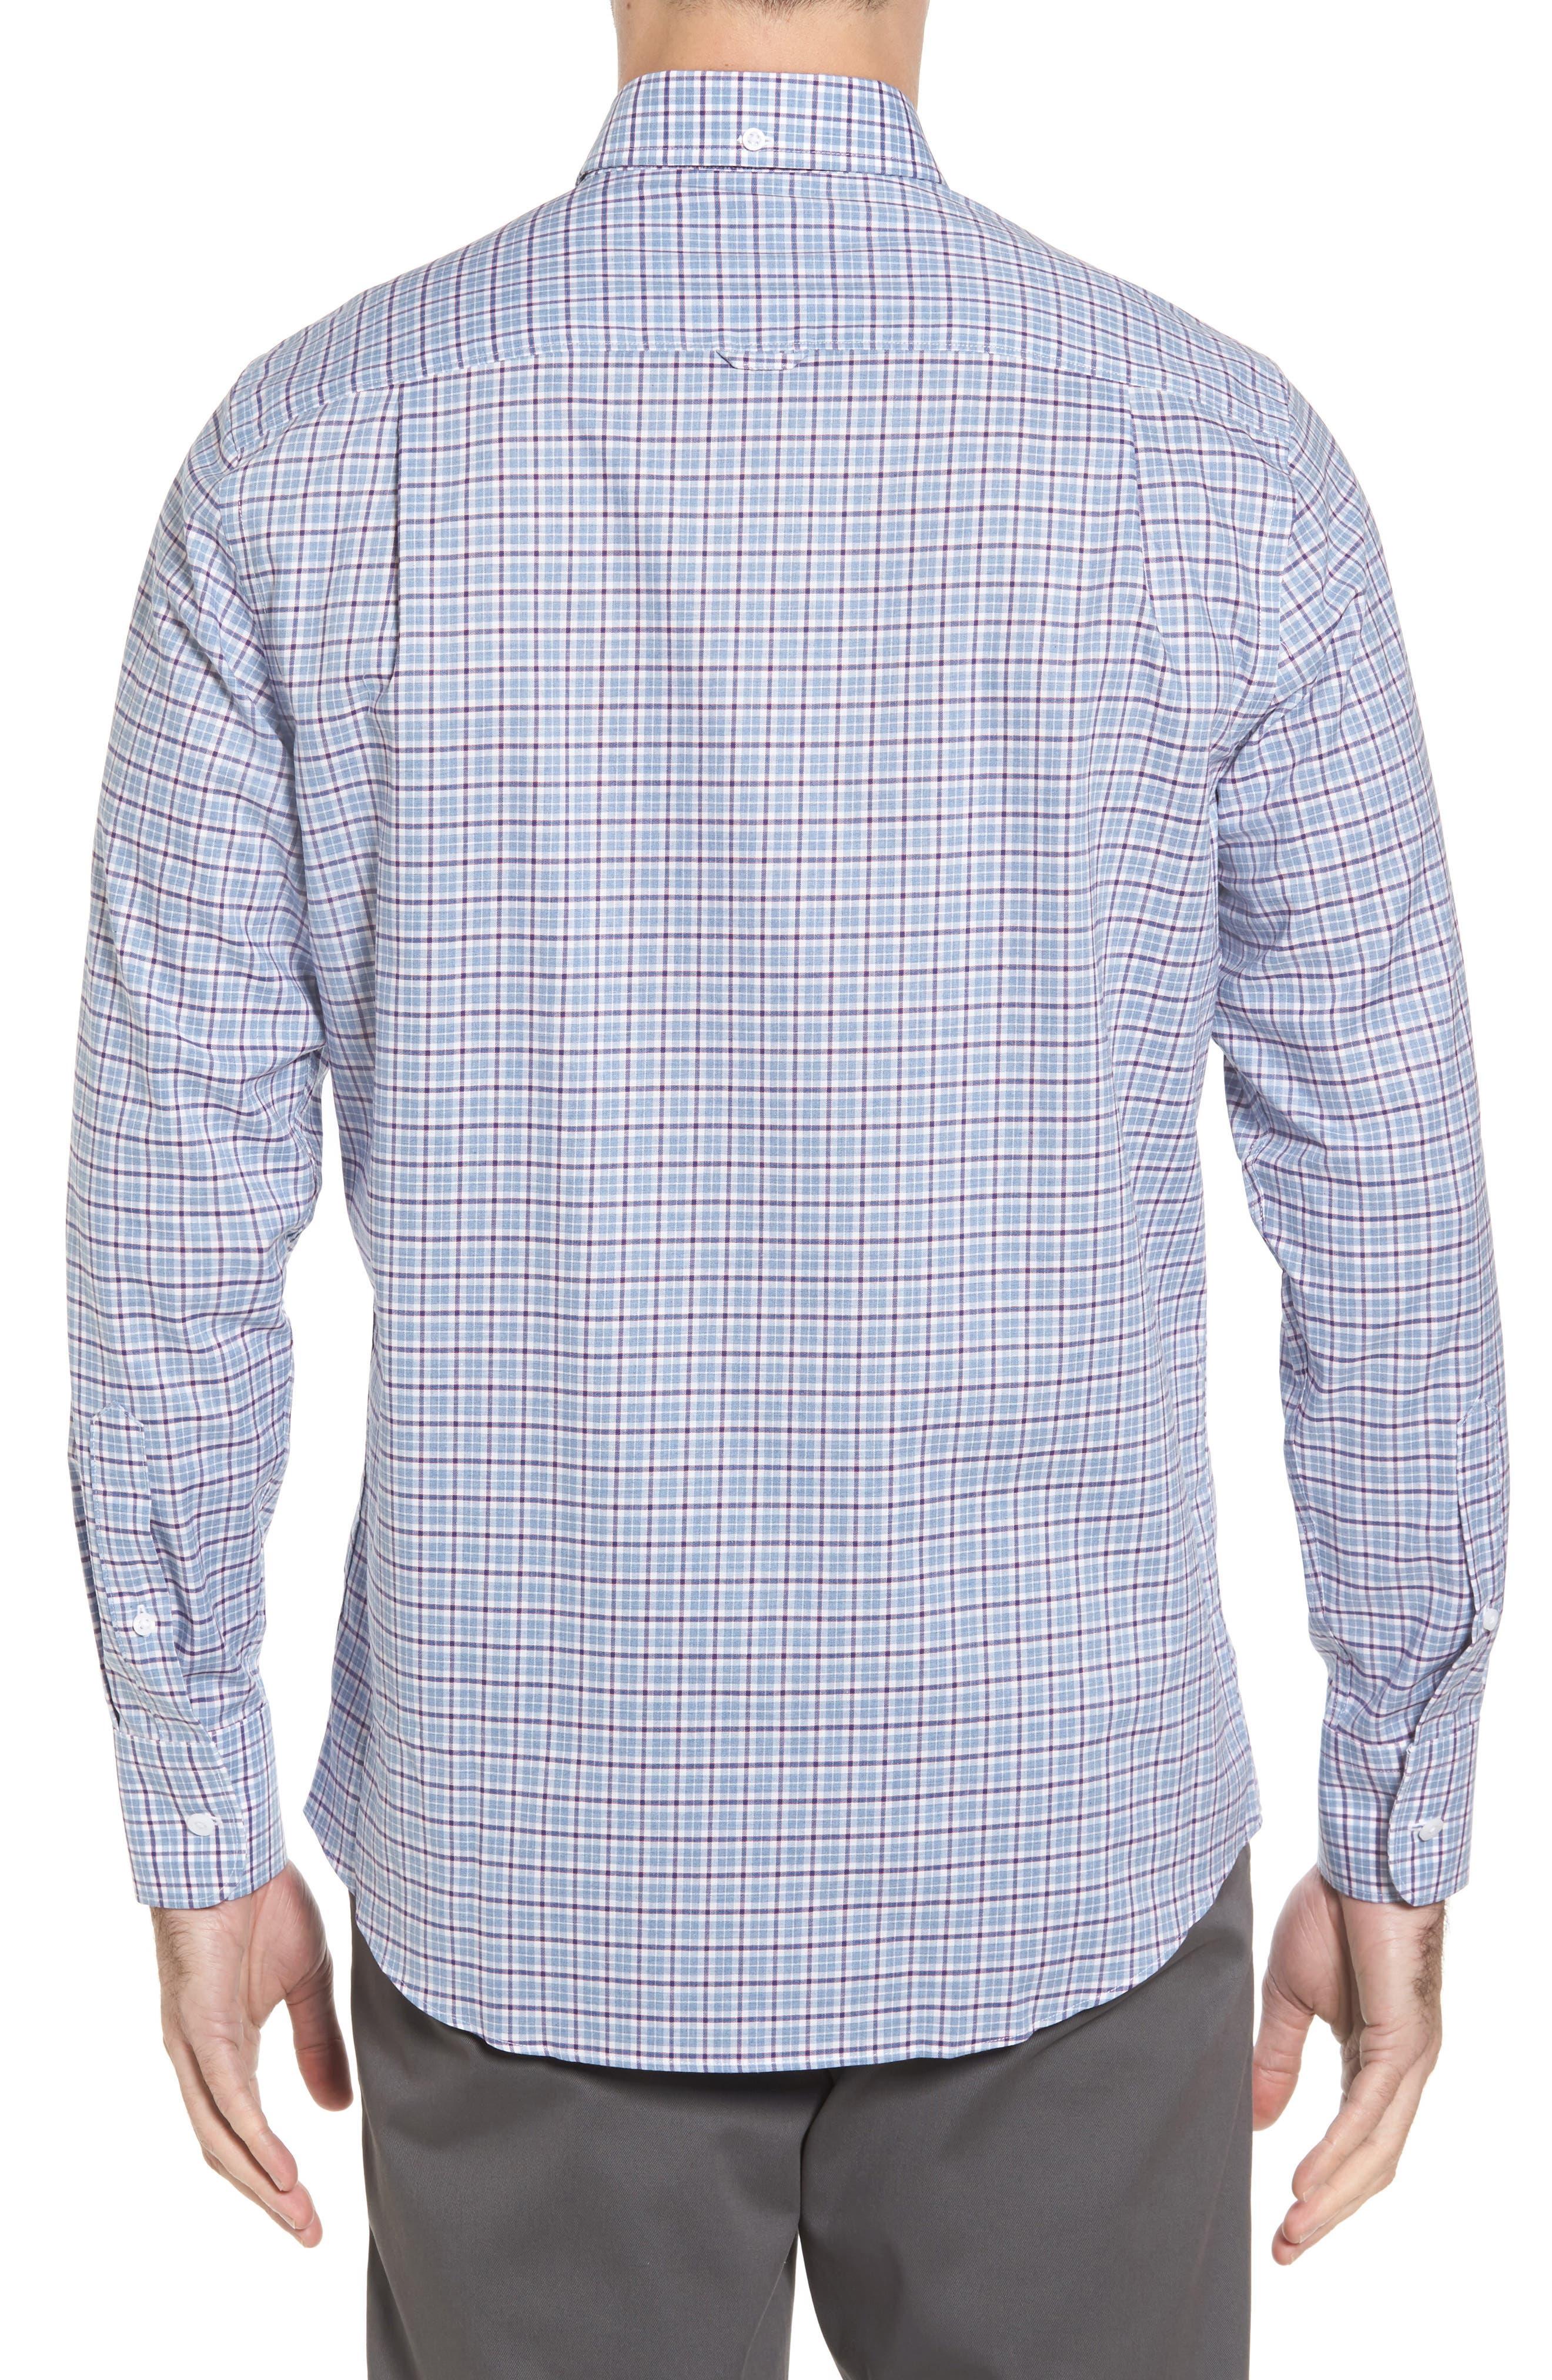 Alternate Image 2  - Nordstrom Men's Shop Non-Iron Regular Fit Check Sport Shirt